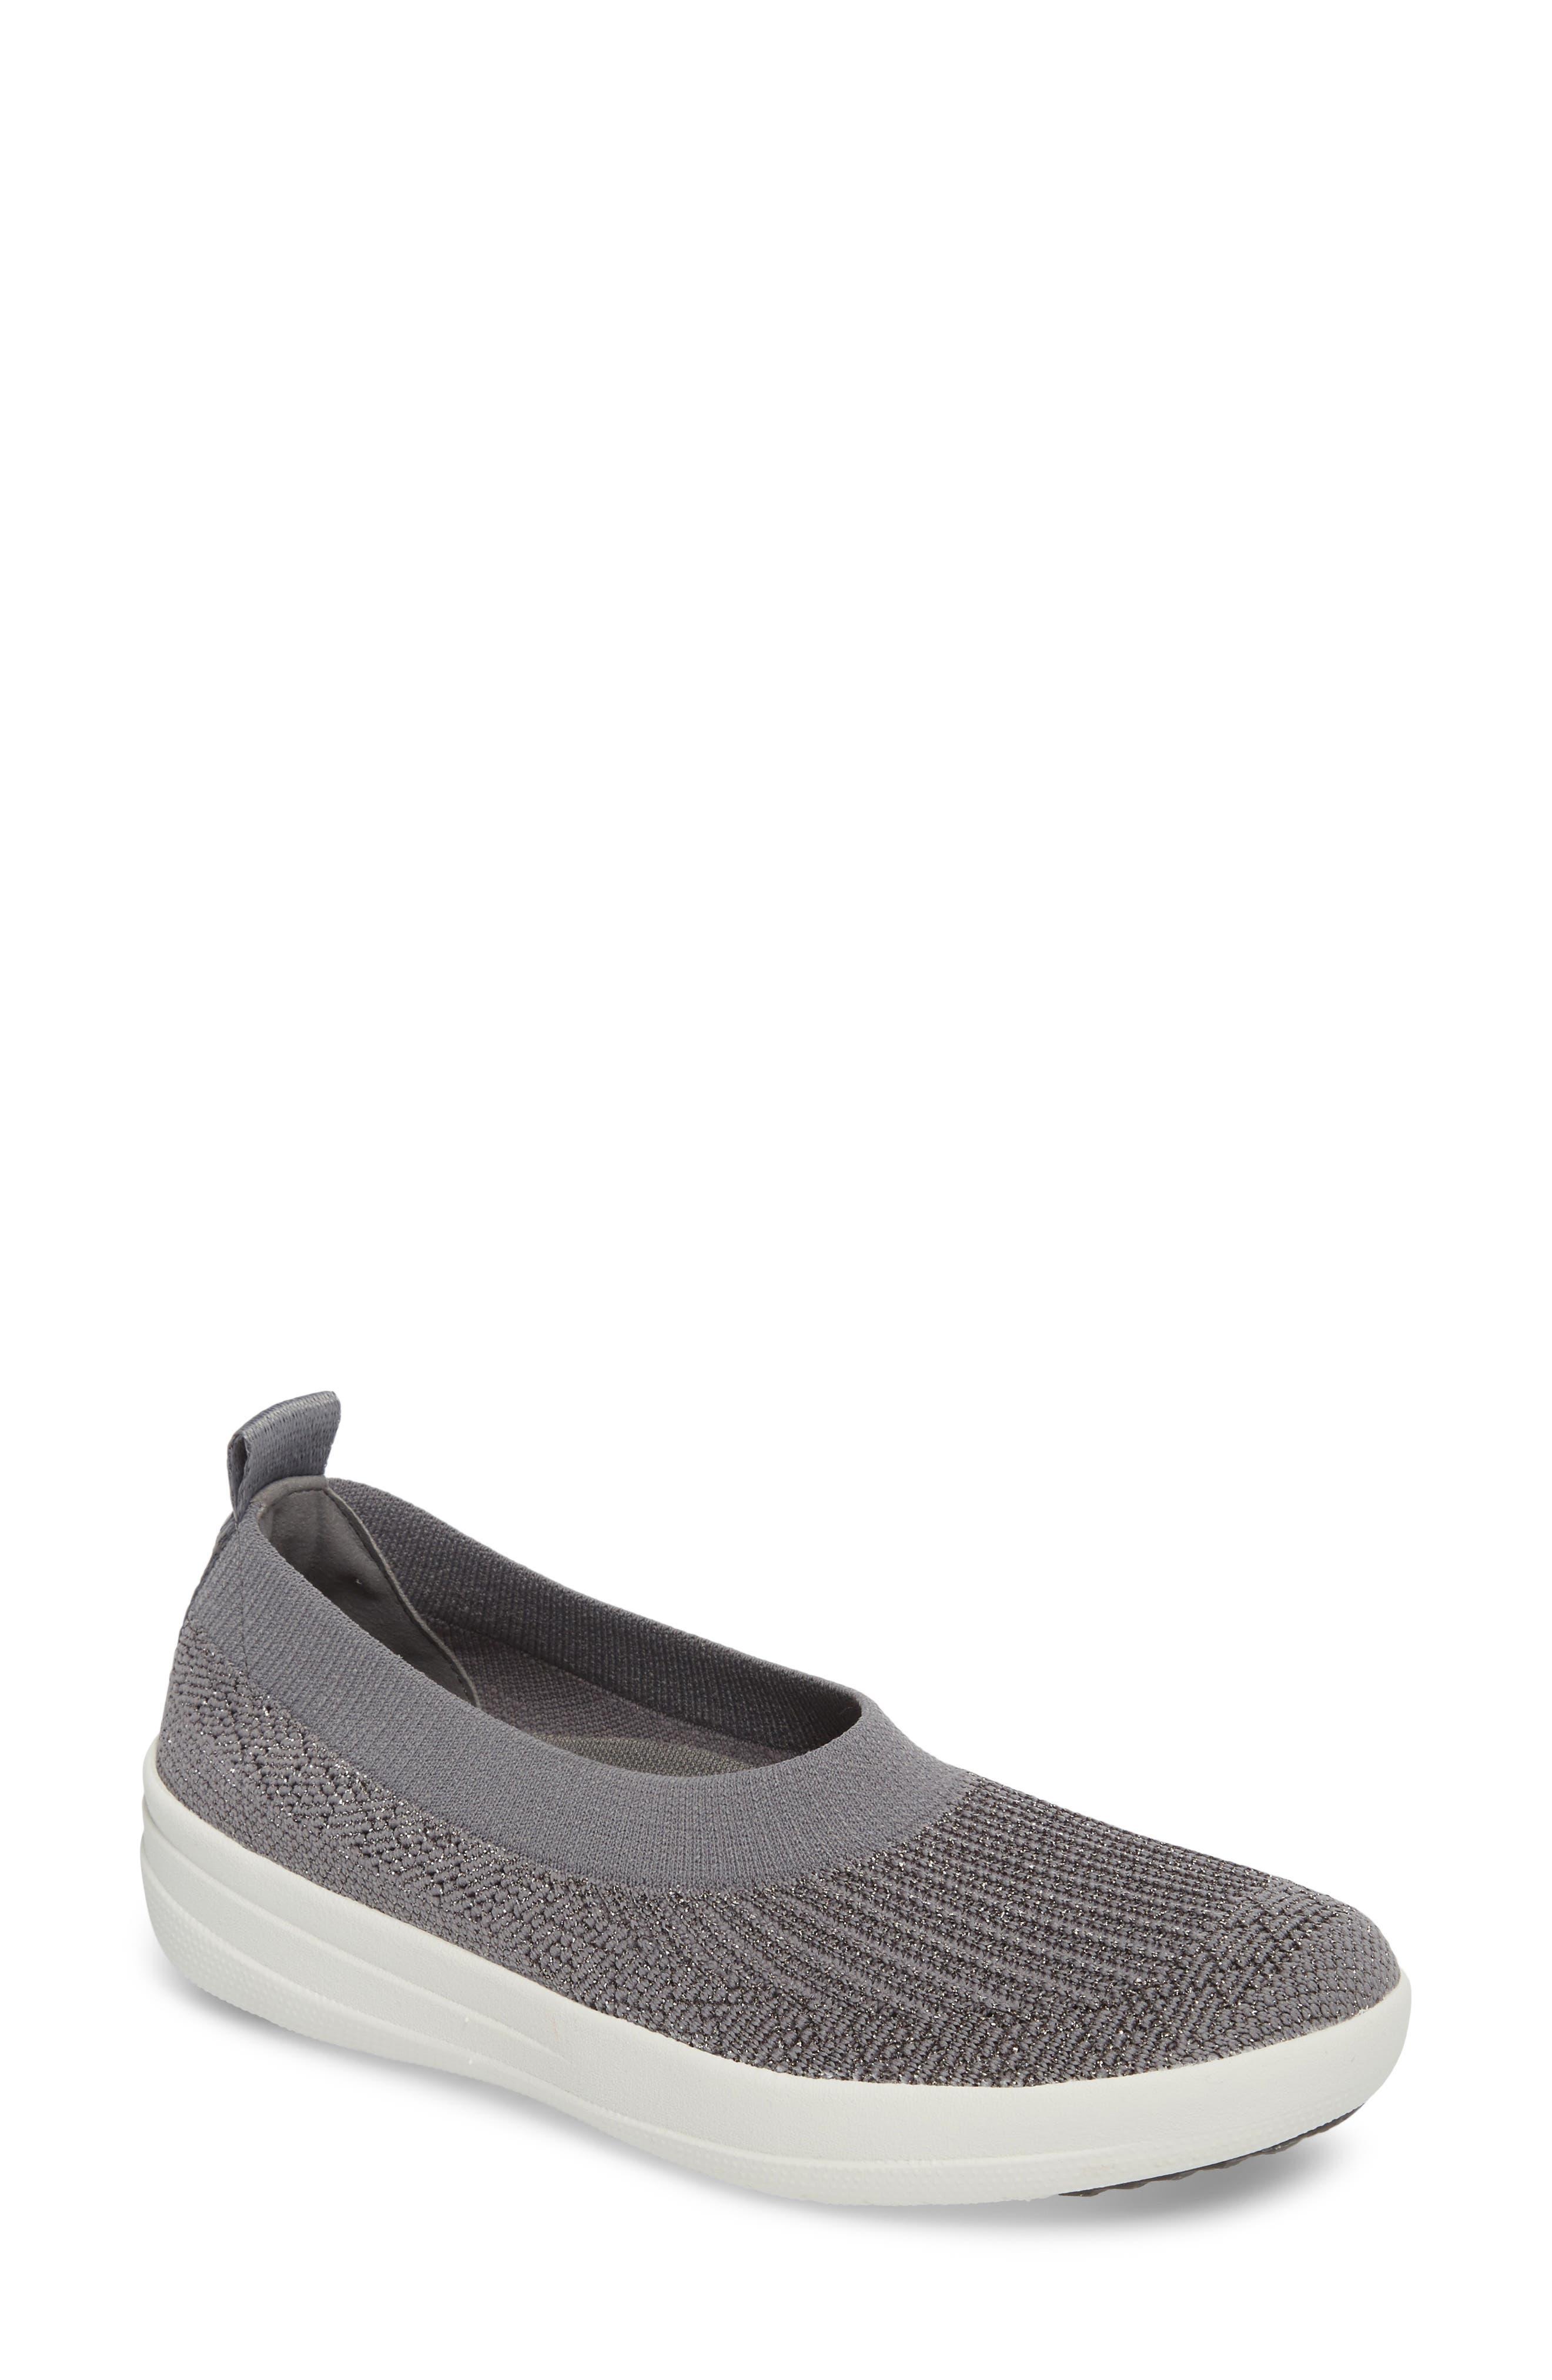 Uberknit<sup>™</sup> Slip-On Ballerina Sneaker,                         Main,                         color, Charcoal/ Metallic Pewter